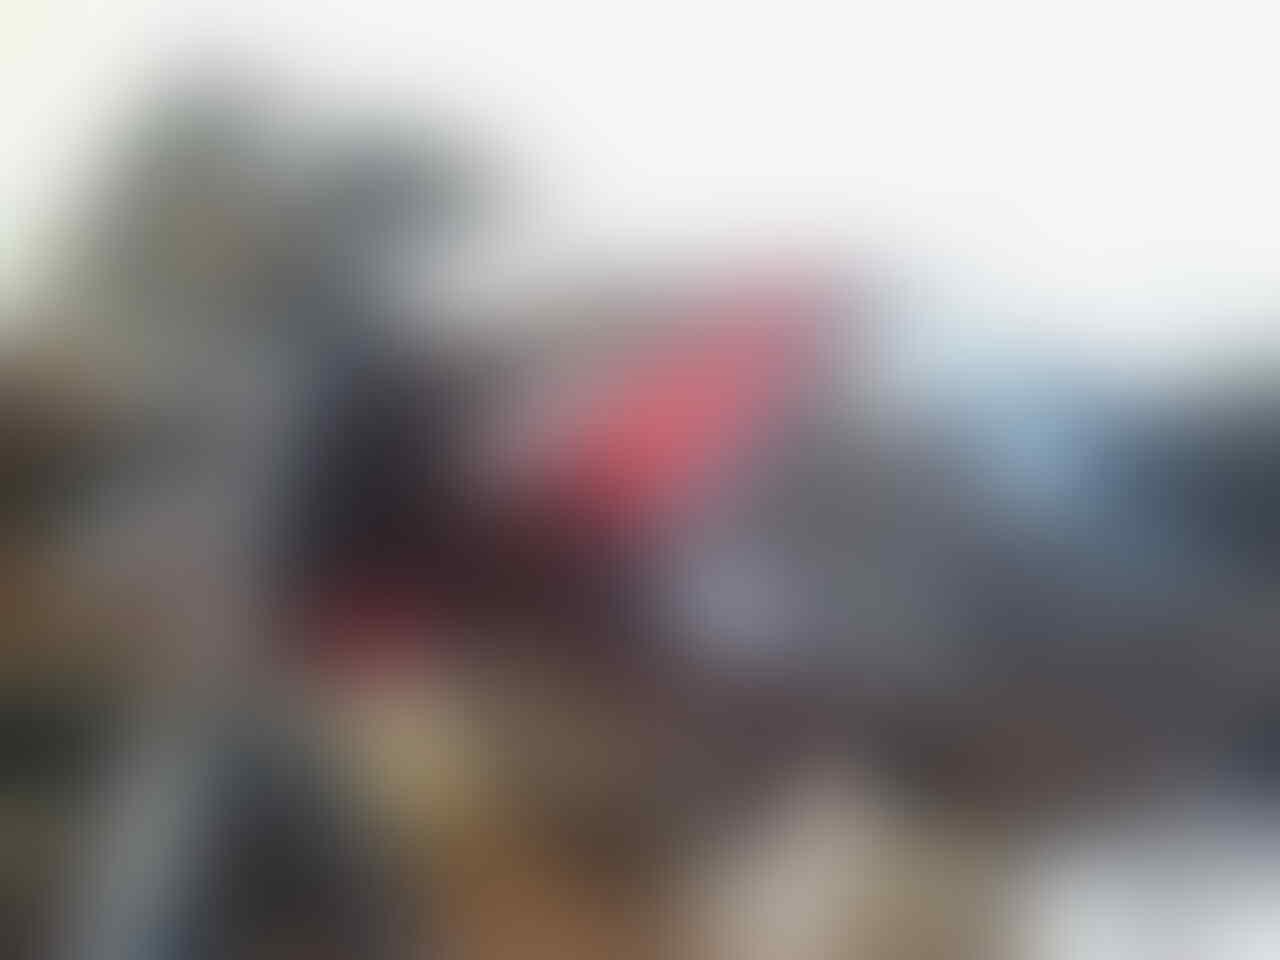 VOD Auto Parts : Custom Tangki Turbular Arm for ur Fav Bike!! (UPDATE TRUS)